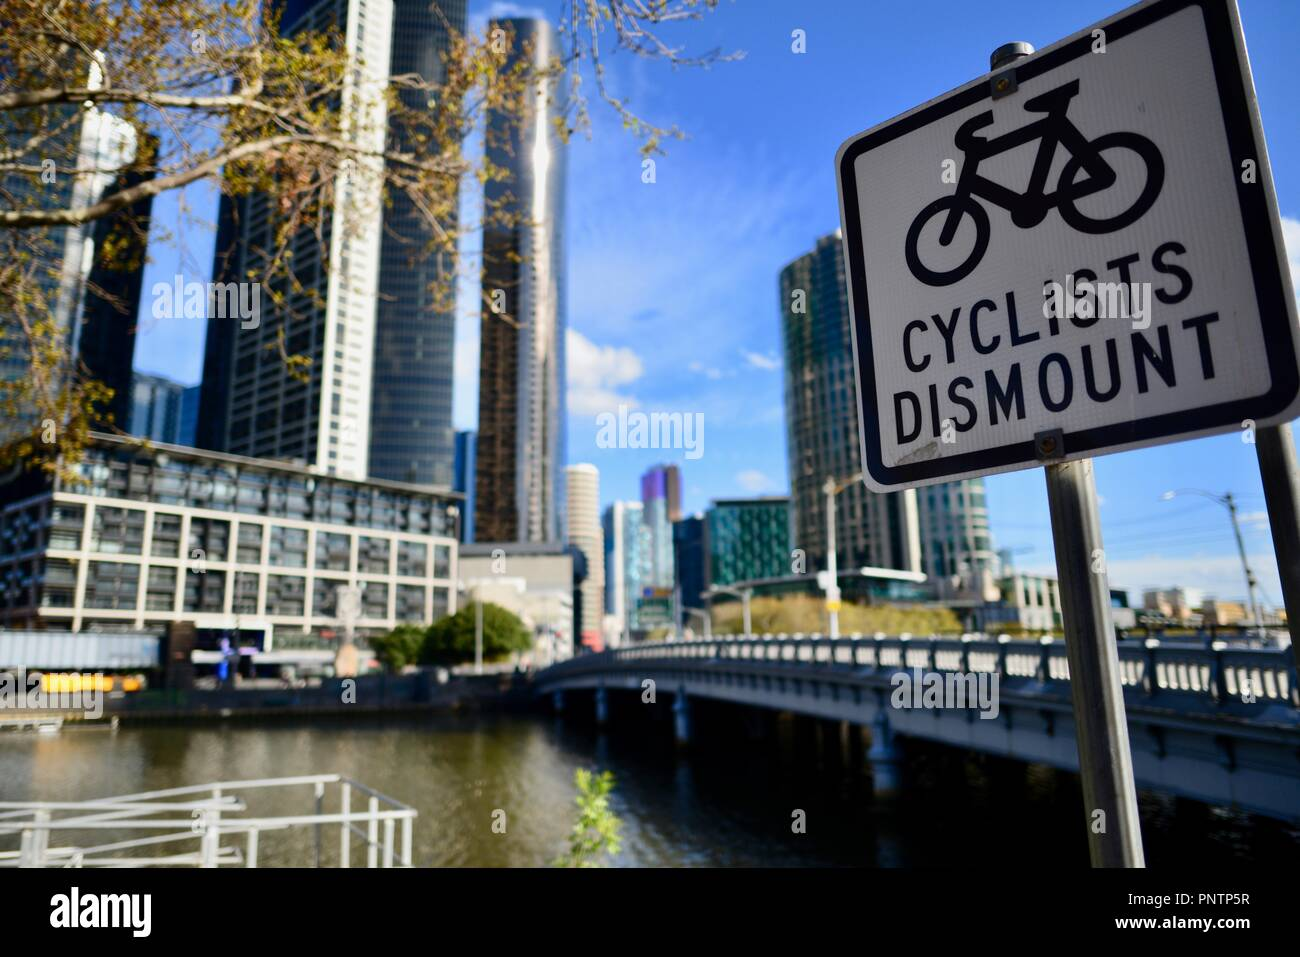 Cyclists dismount sign, Melbourne VIC, Australia Stock Photo